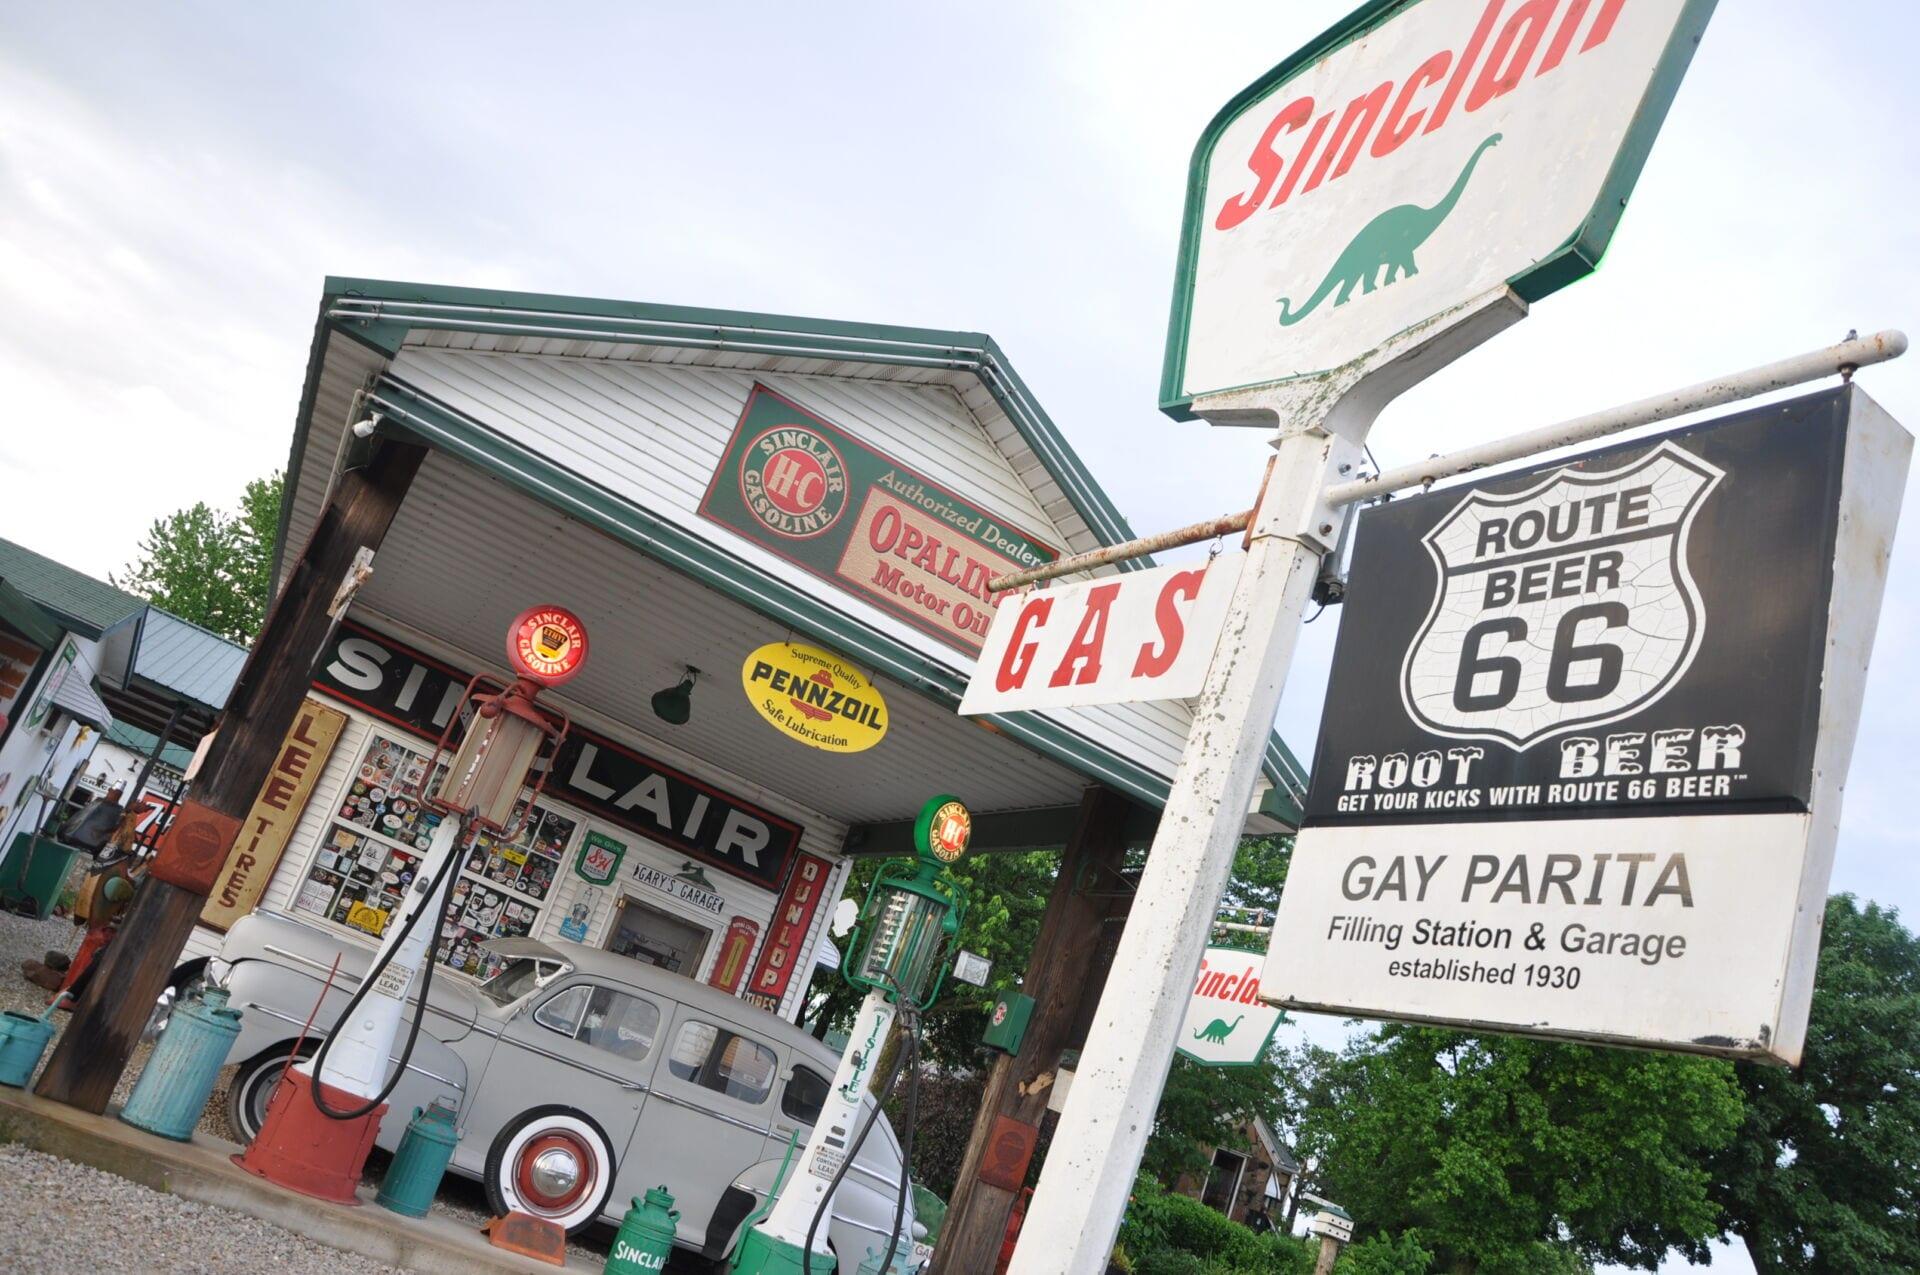 Gay Parita Sinclair Station Route 66 Missouri